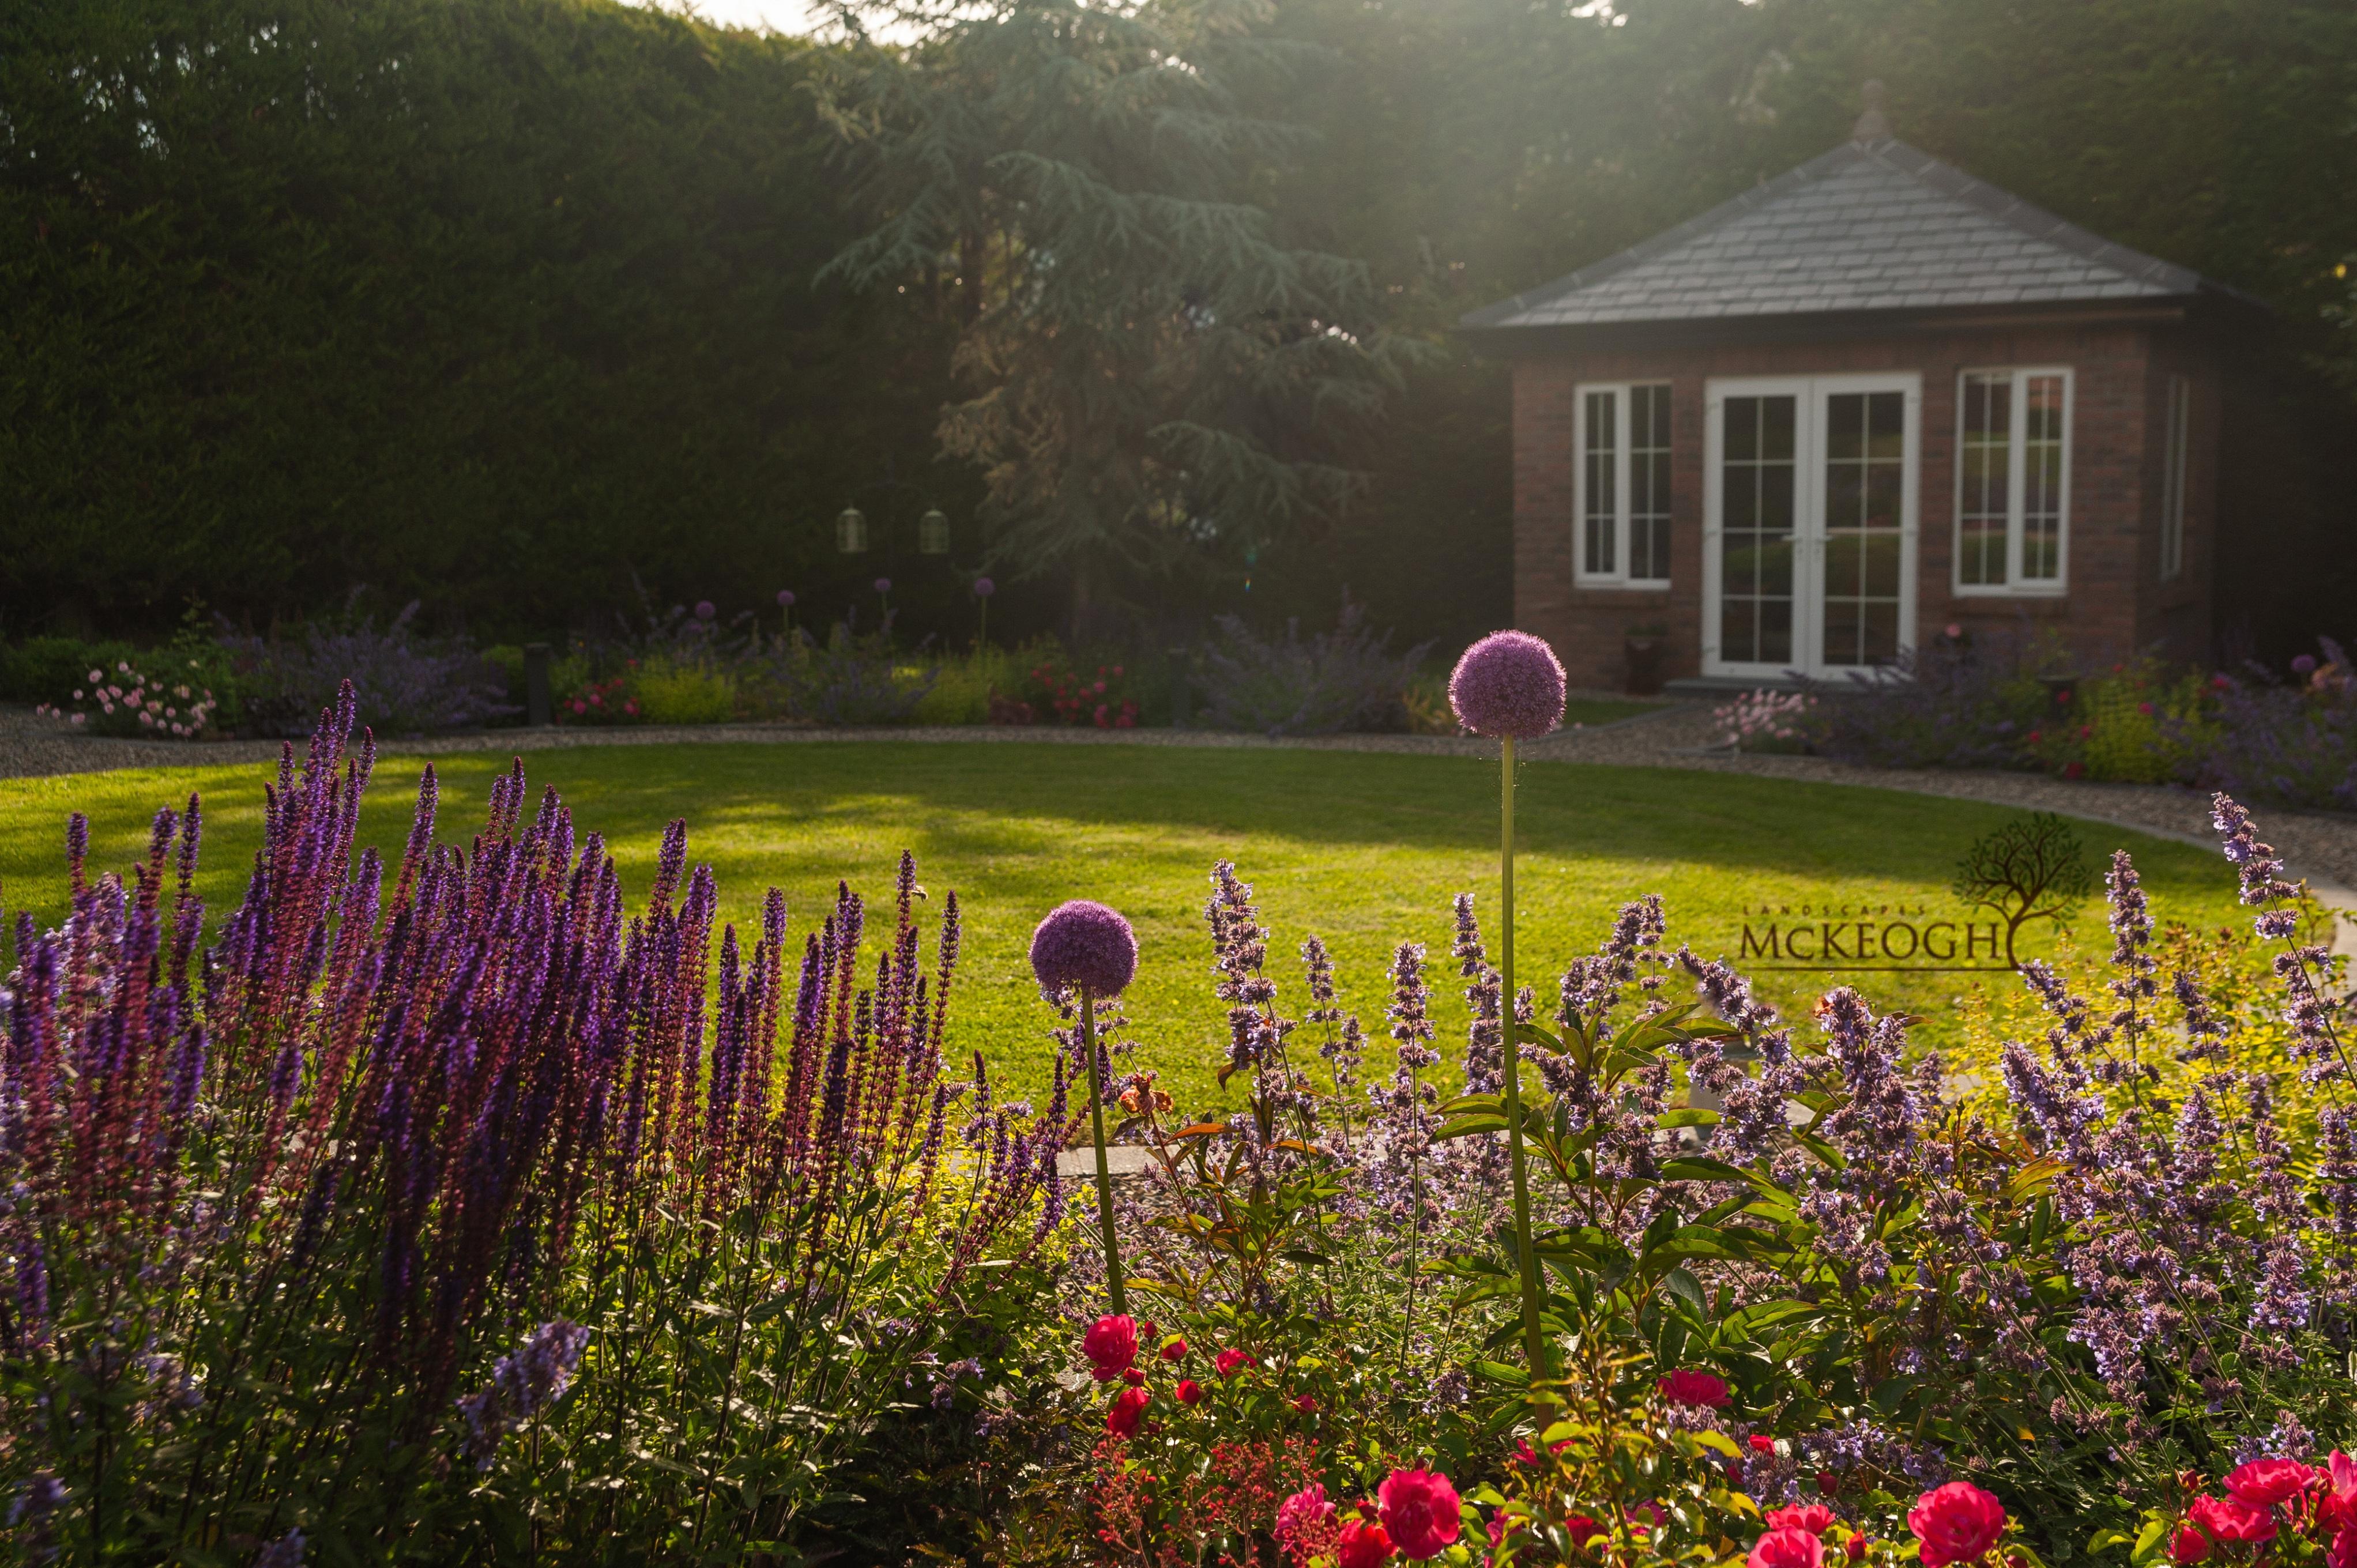 McKeogh-landscapers-garden-designers-Limerick